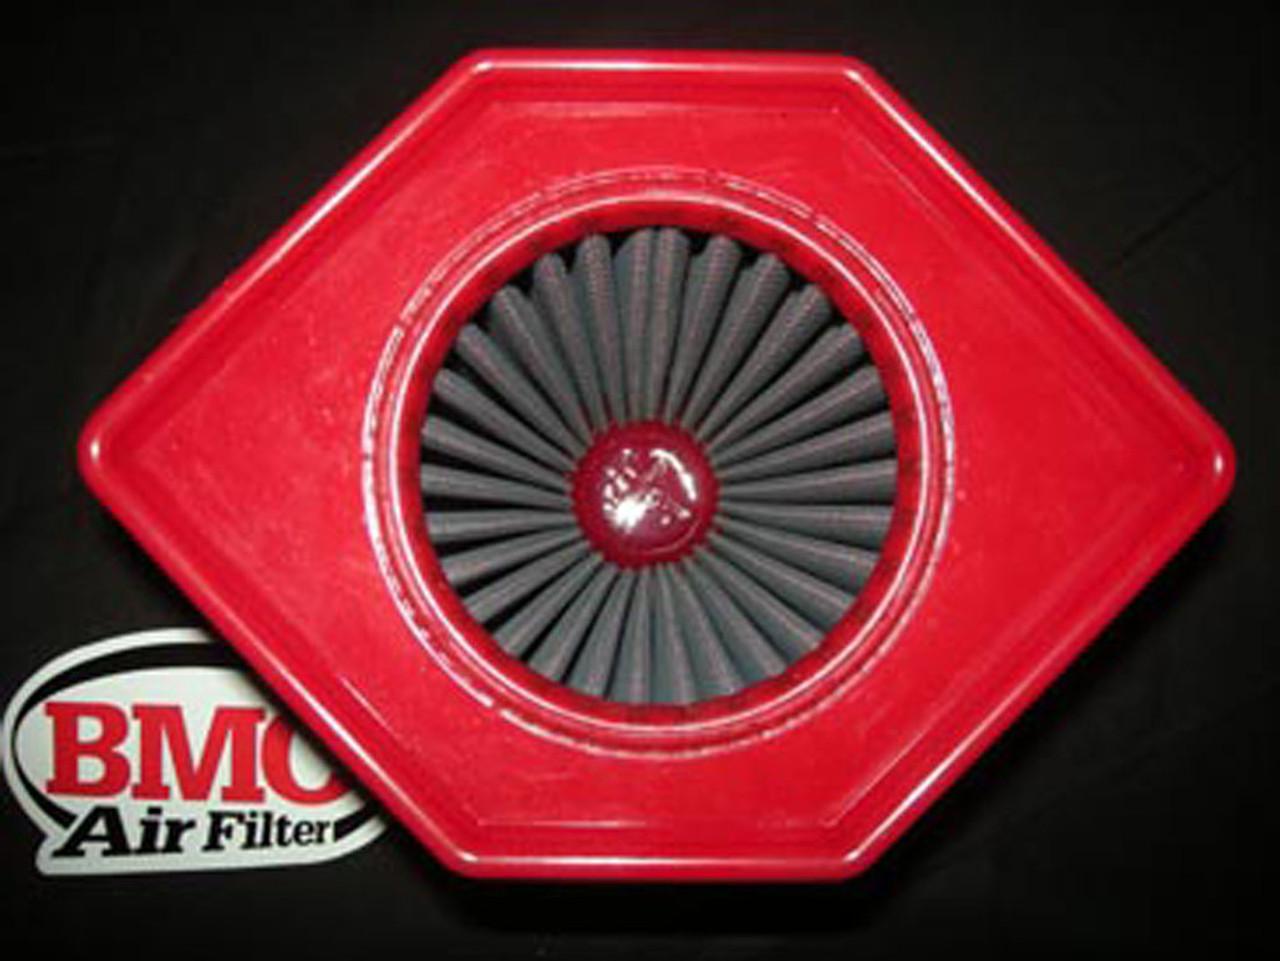 BMC Air Filter BMW K1300 FM569/08